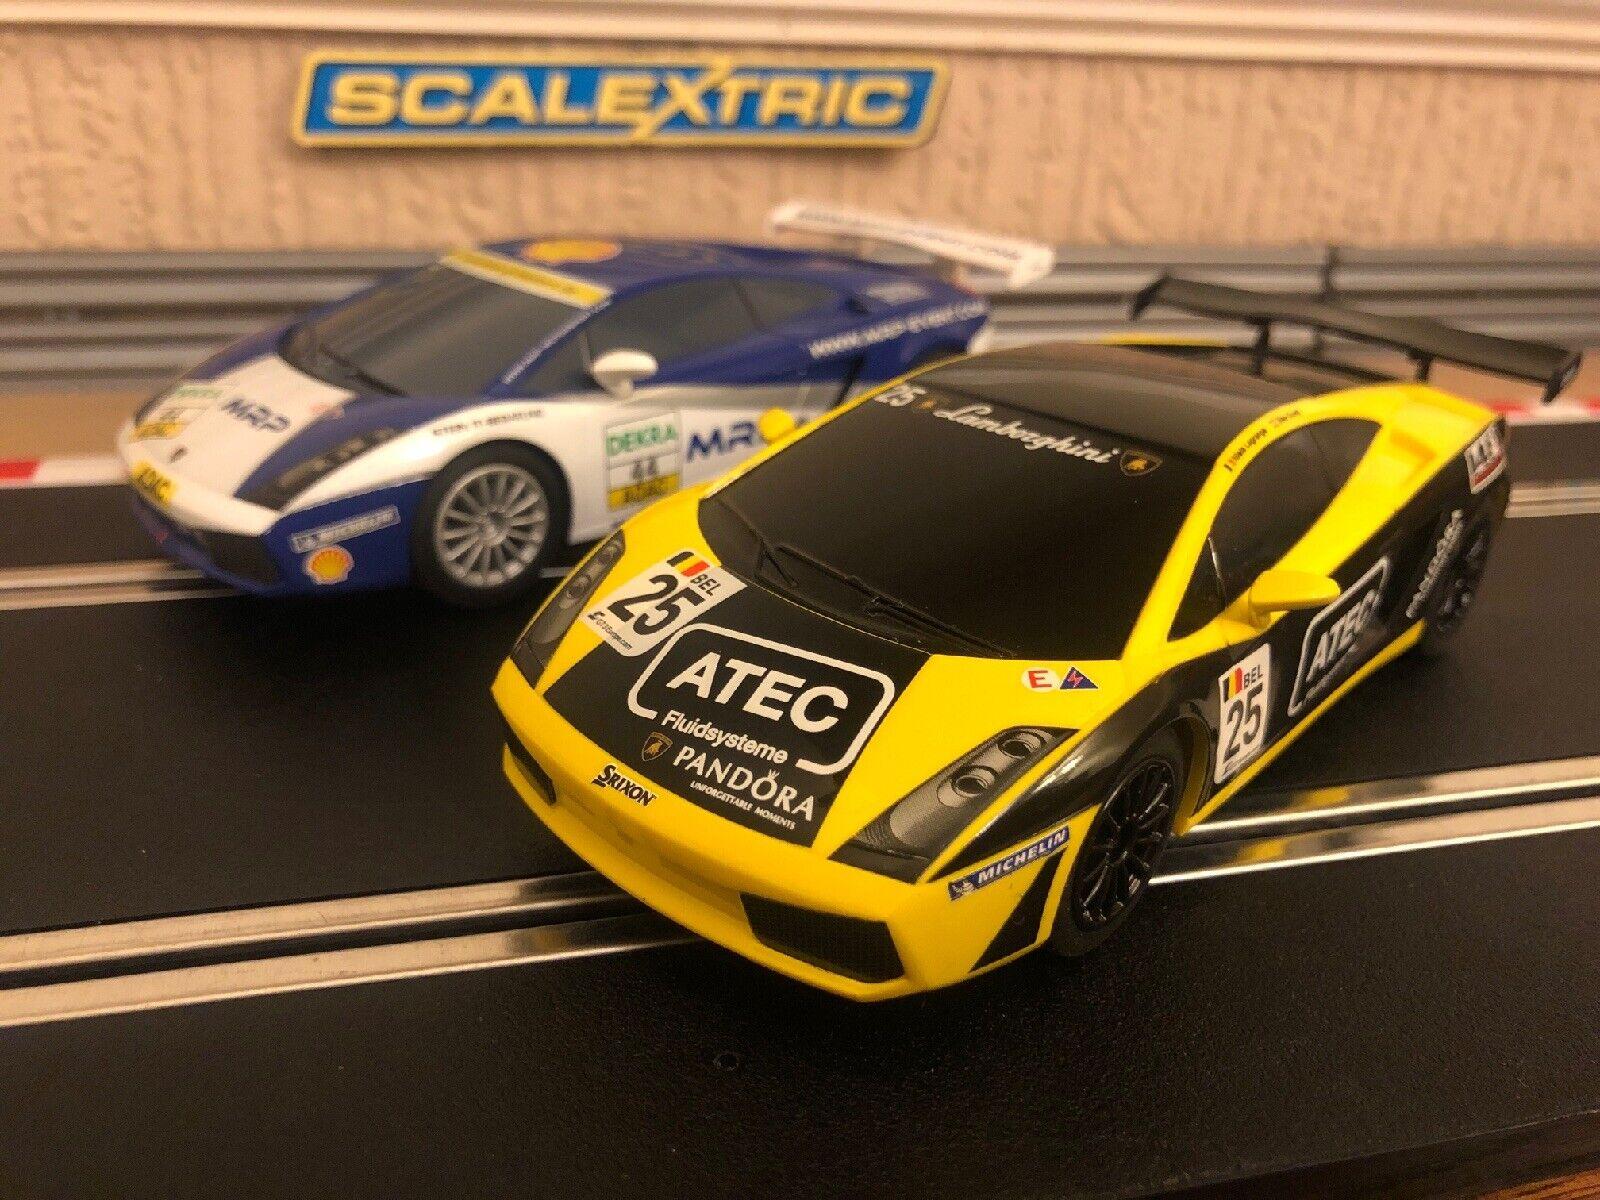 Skalextris Lamborghini Gallardo GT No25& No44 Båda i myntkondition